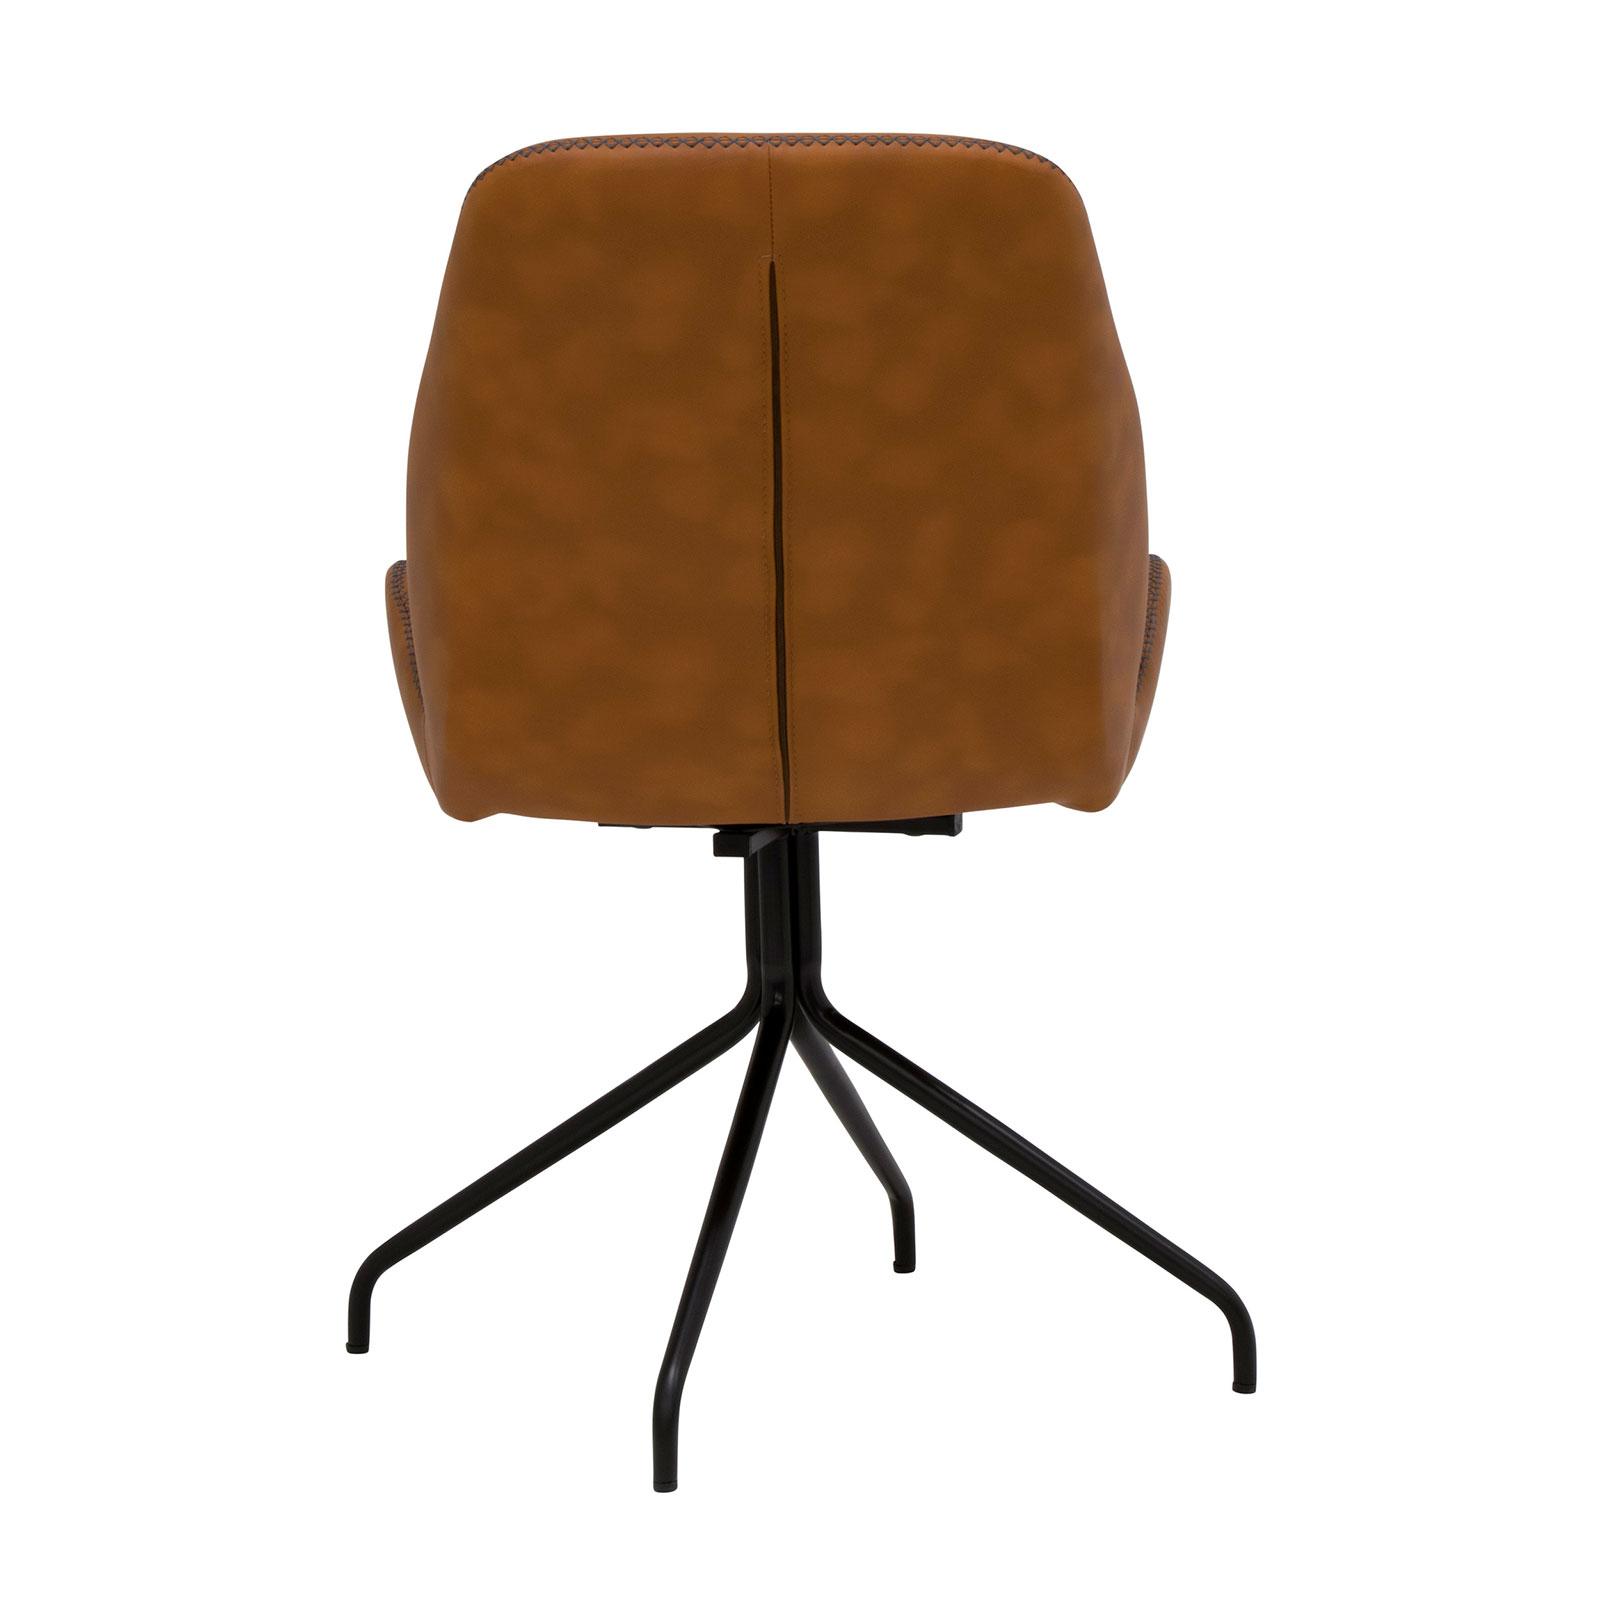 52001-Devonport-Office-Chair-rear